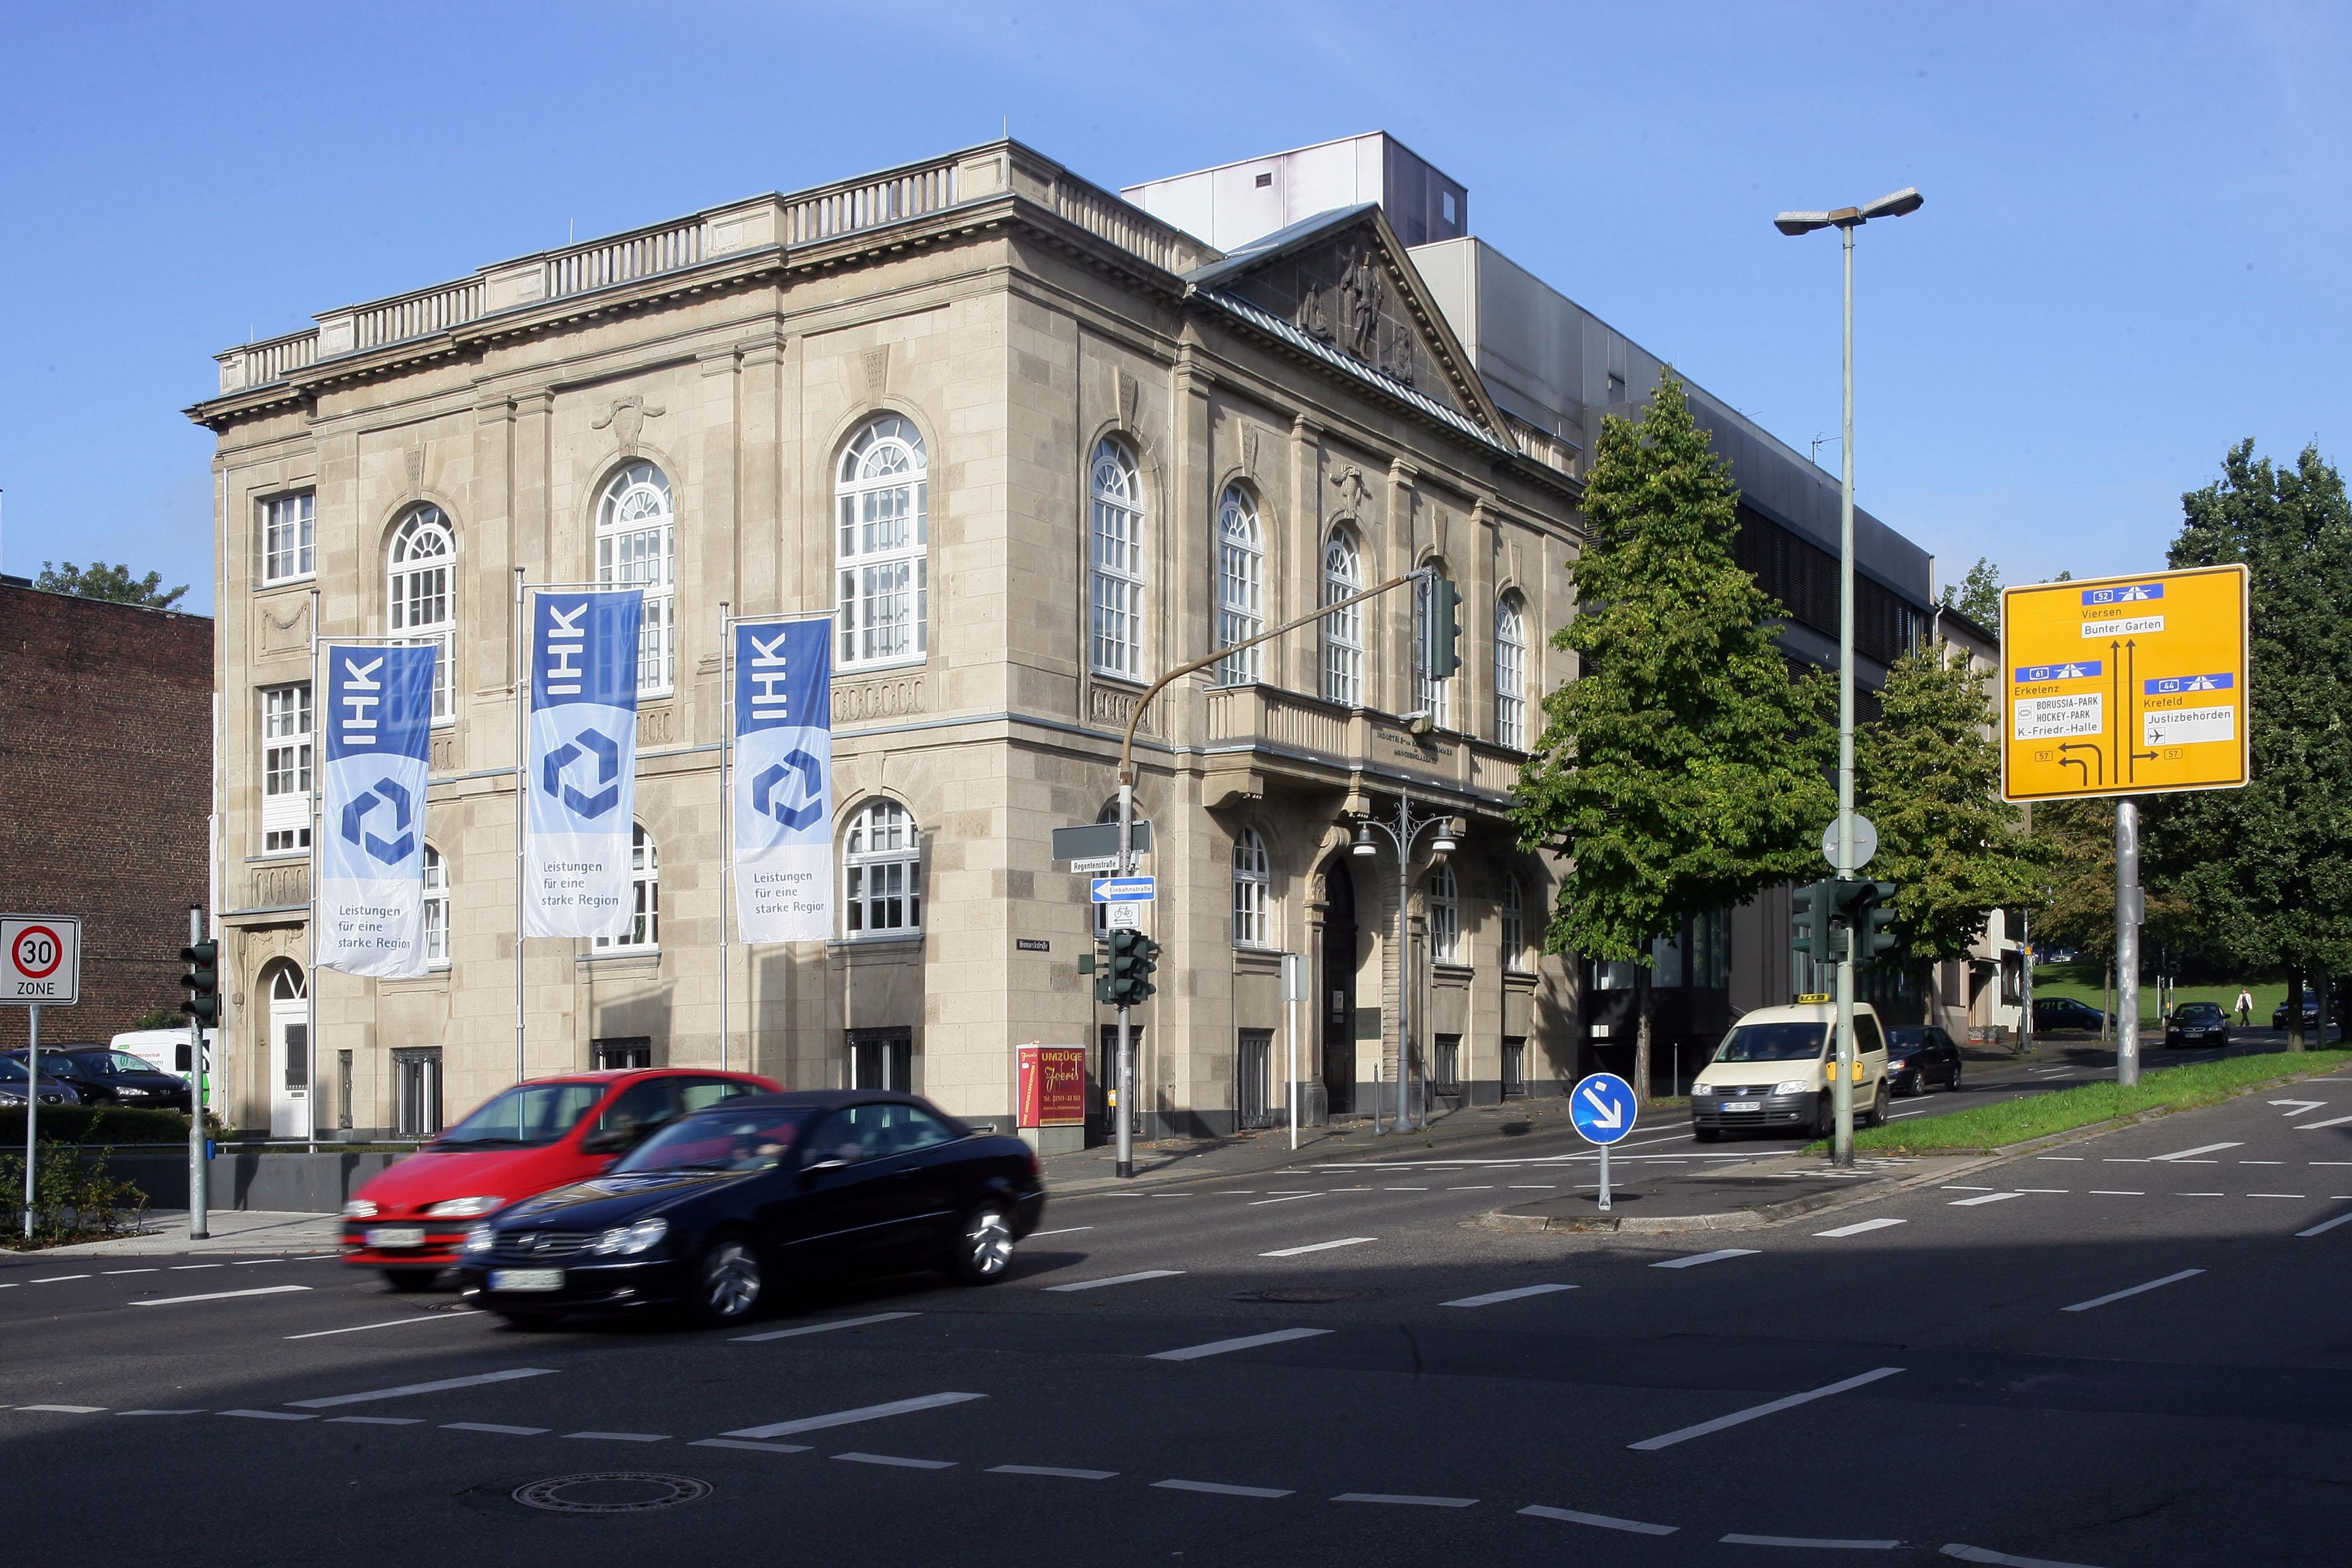 Bismarckstraße Mönchengladbach file ihk moenchengladbach jpg wikimedia commons